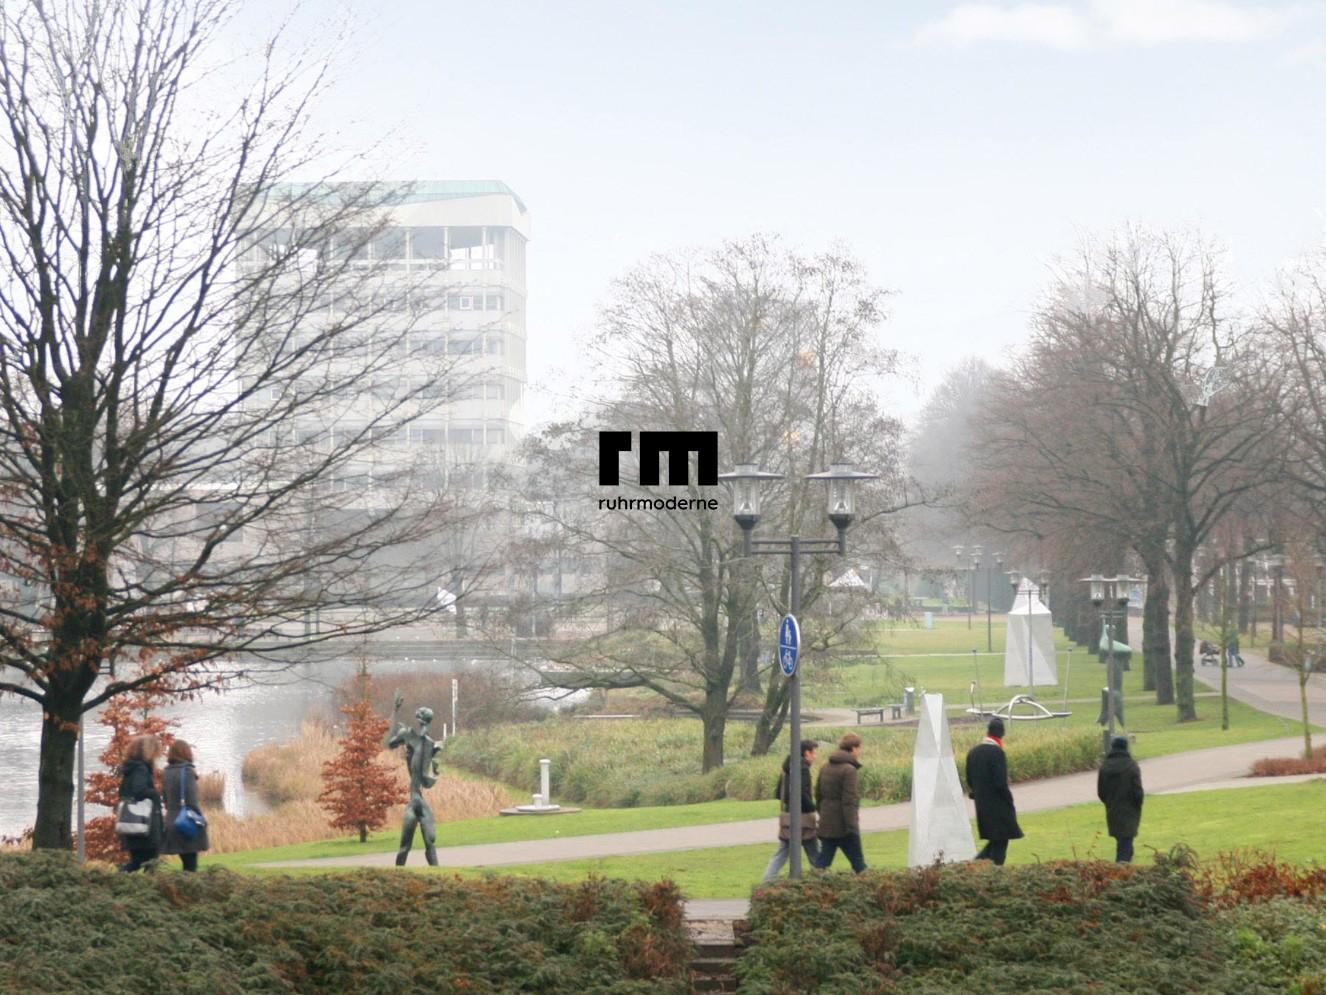 Das Team der Ruhrmoderne auf Erkundungstour in Marl - Foto: Ruhrmoderne e.V.